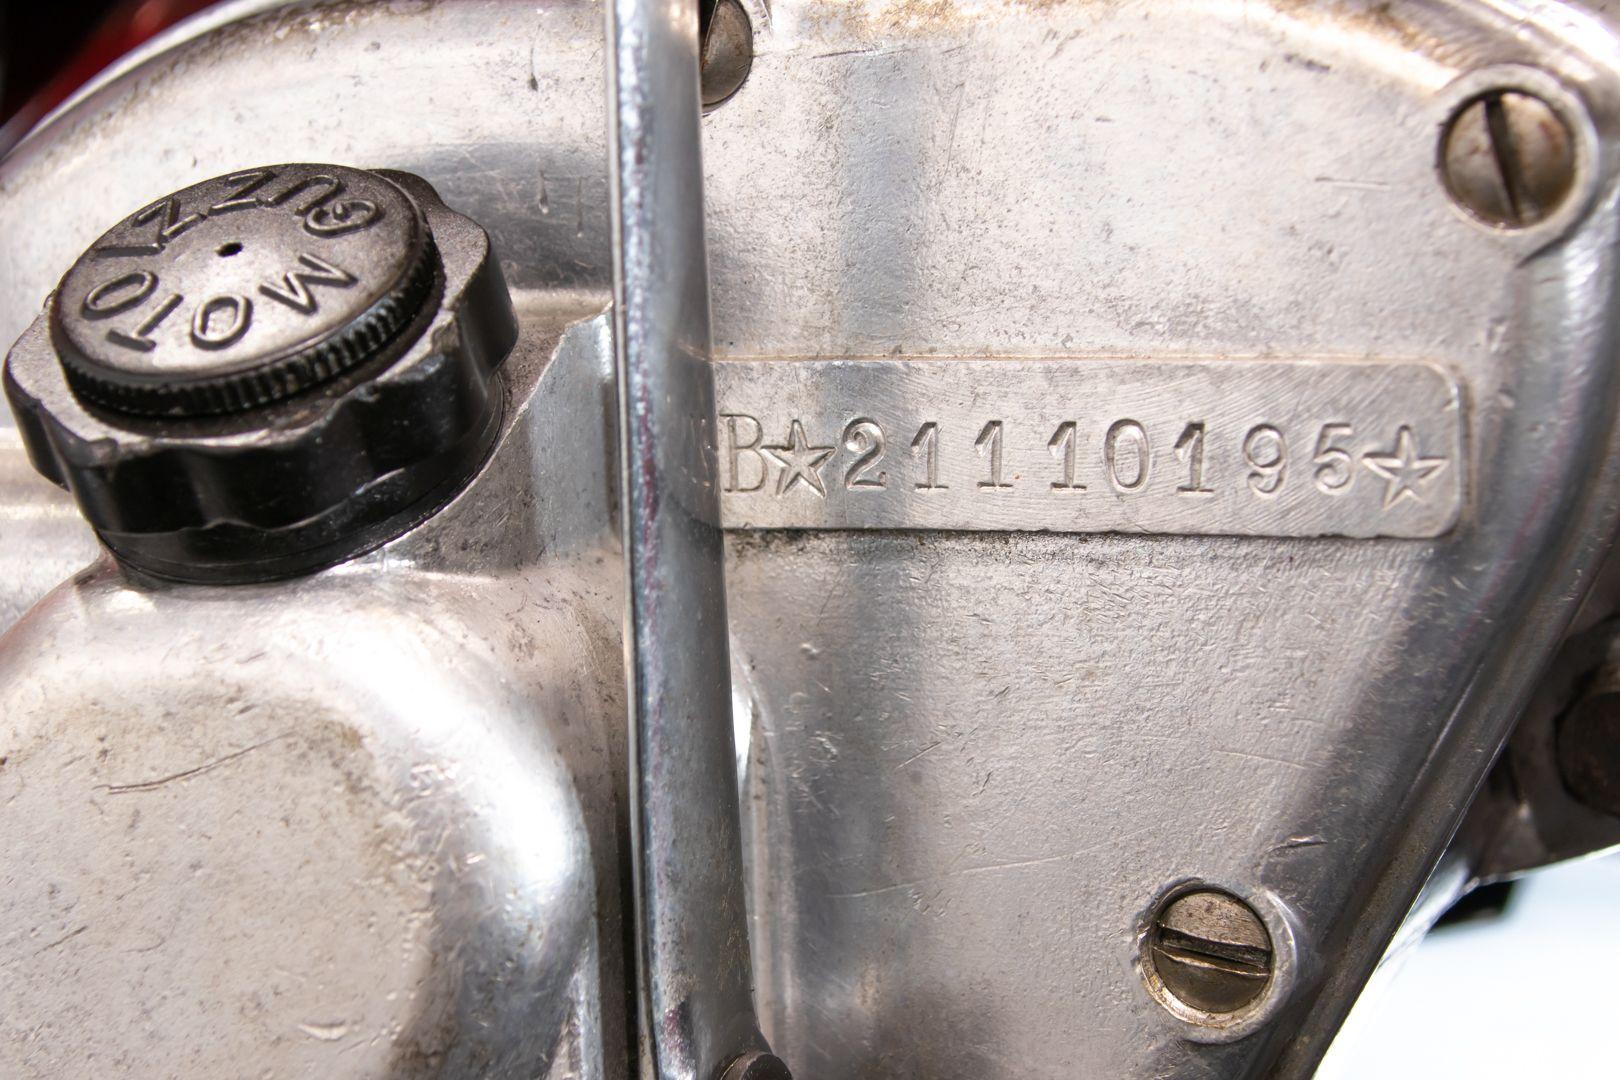 1952 Moto Guzzi 65 59401